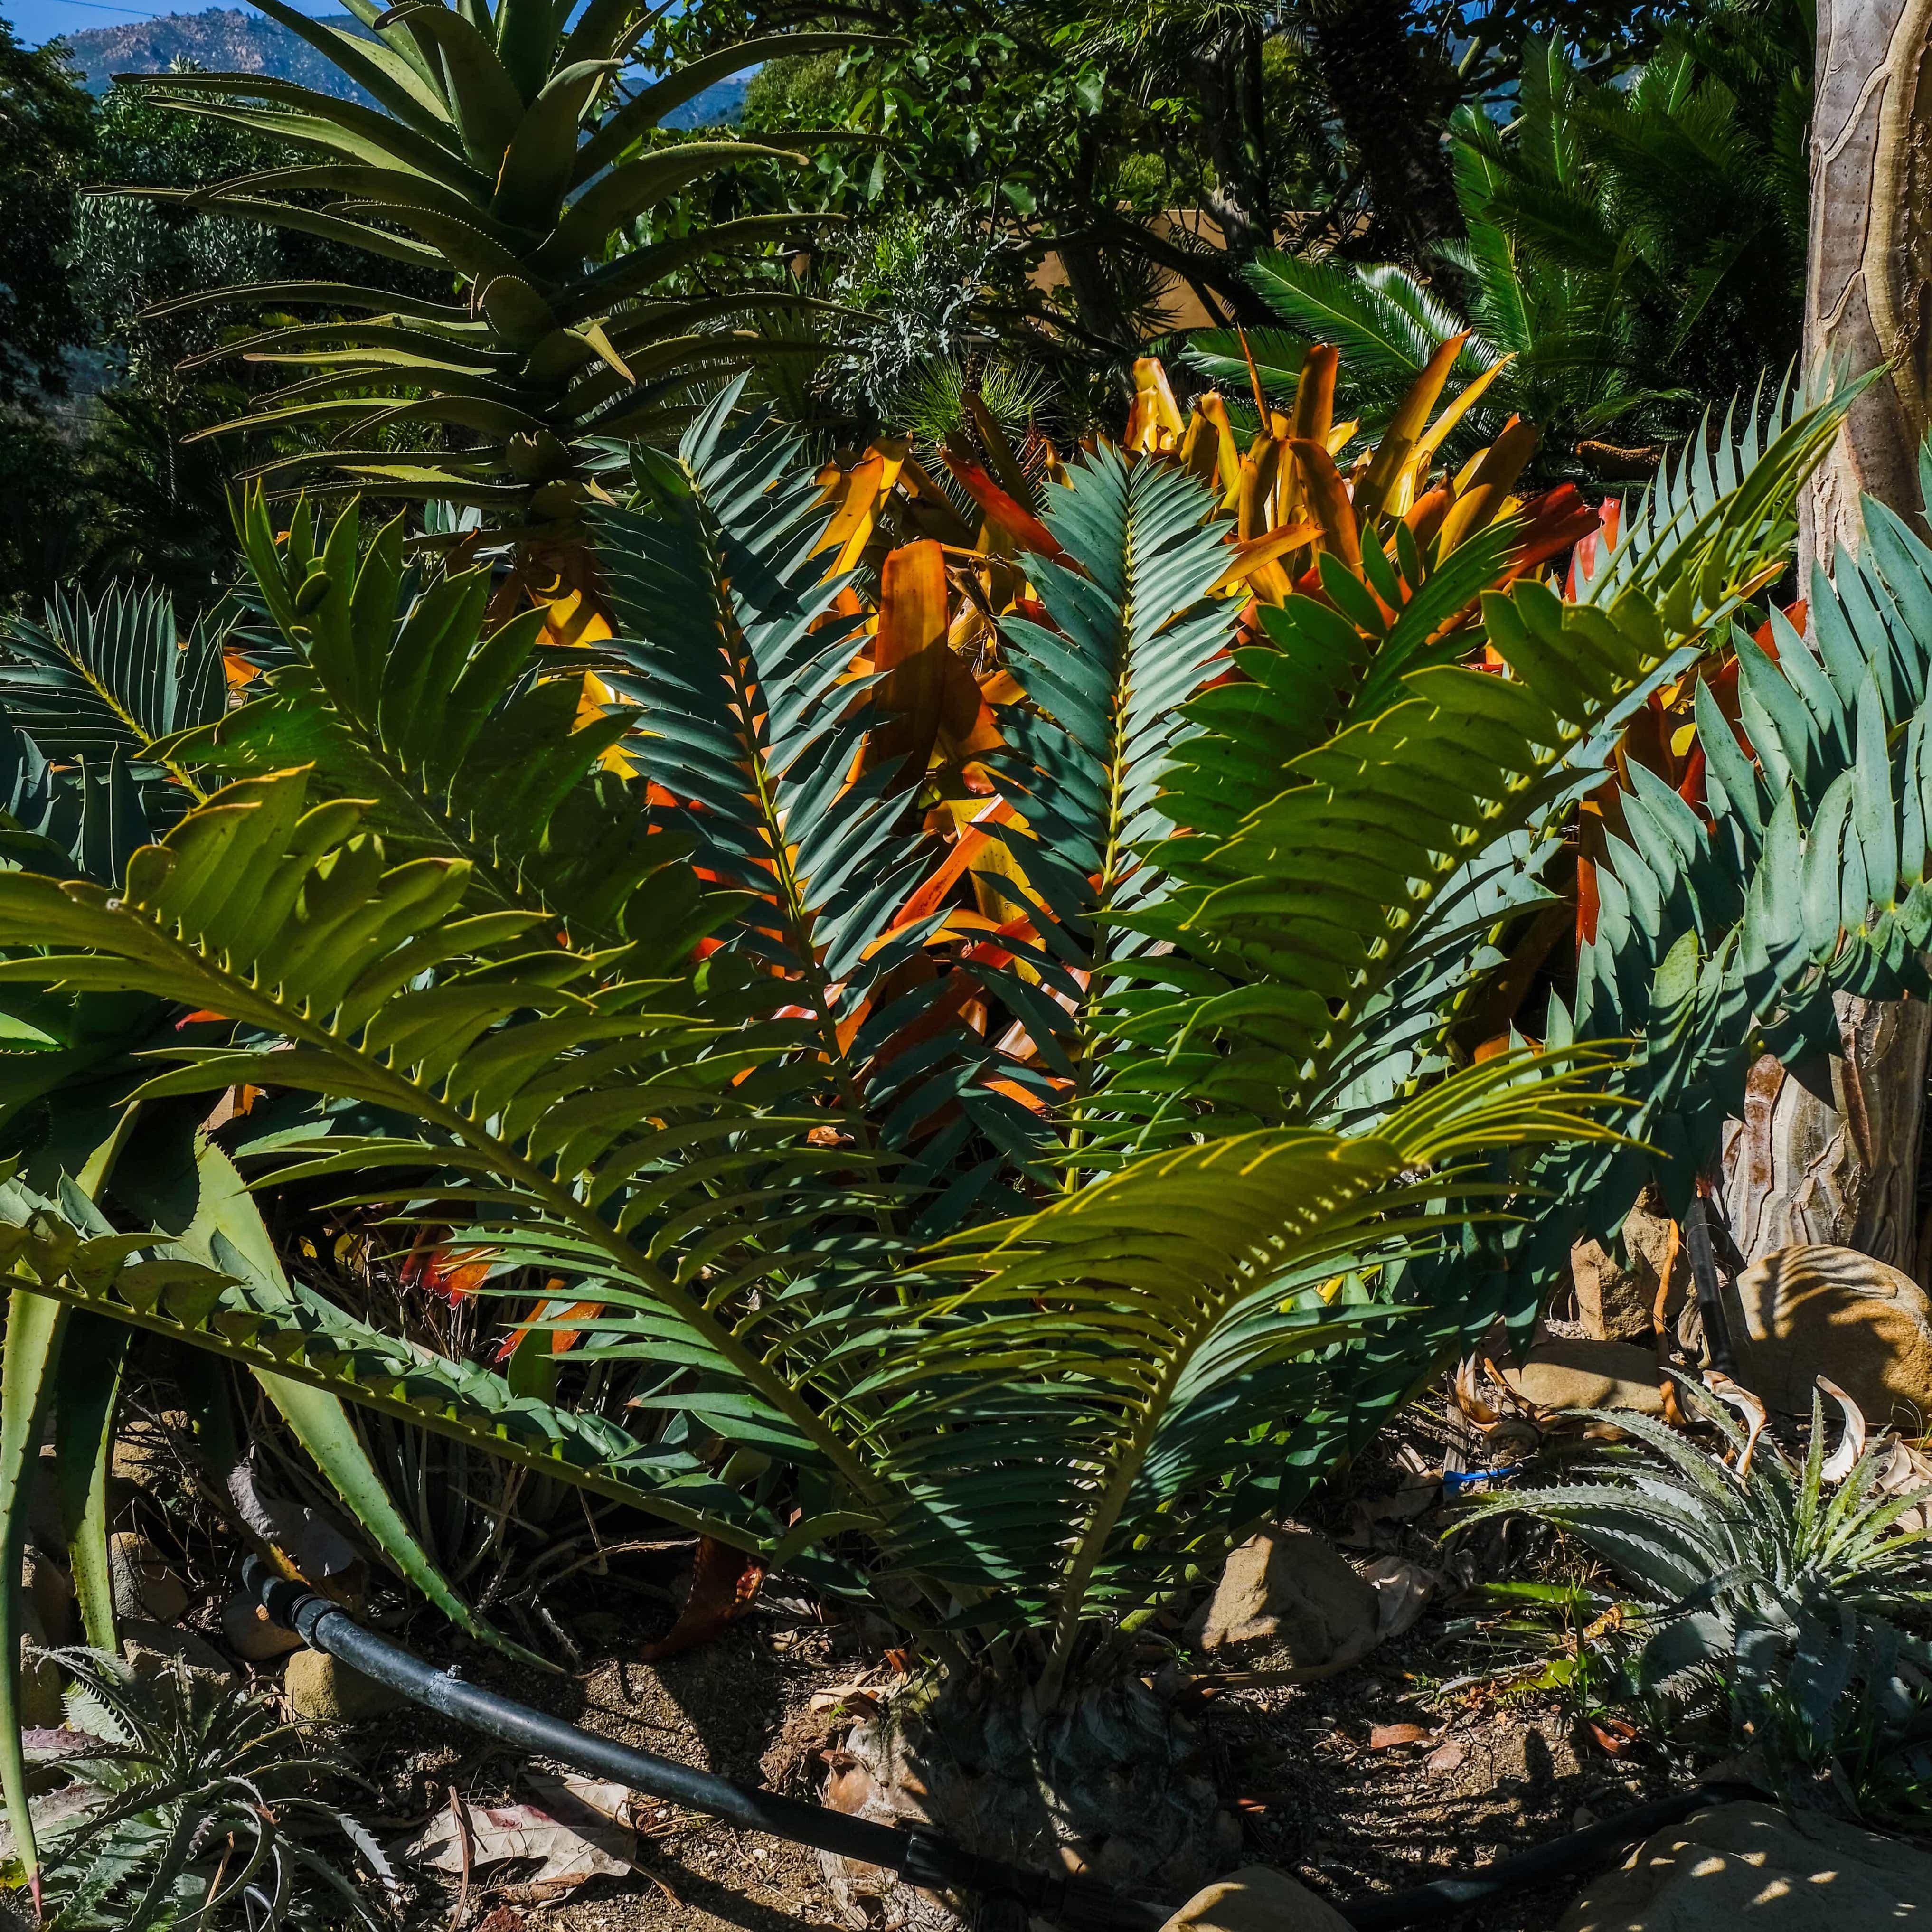 encephalartos lehmannii x transvenosus